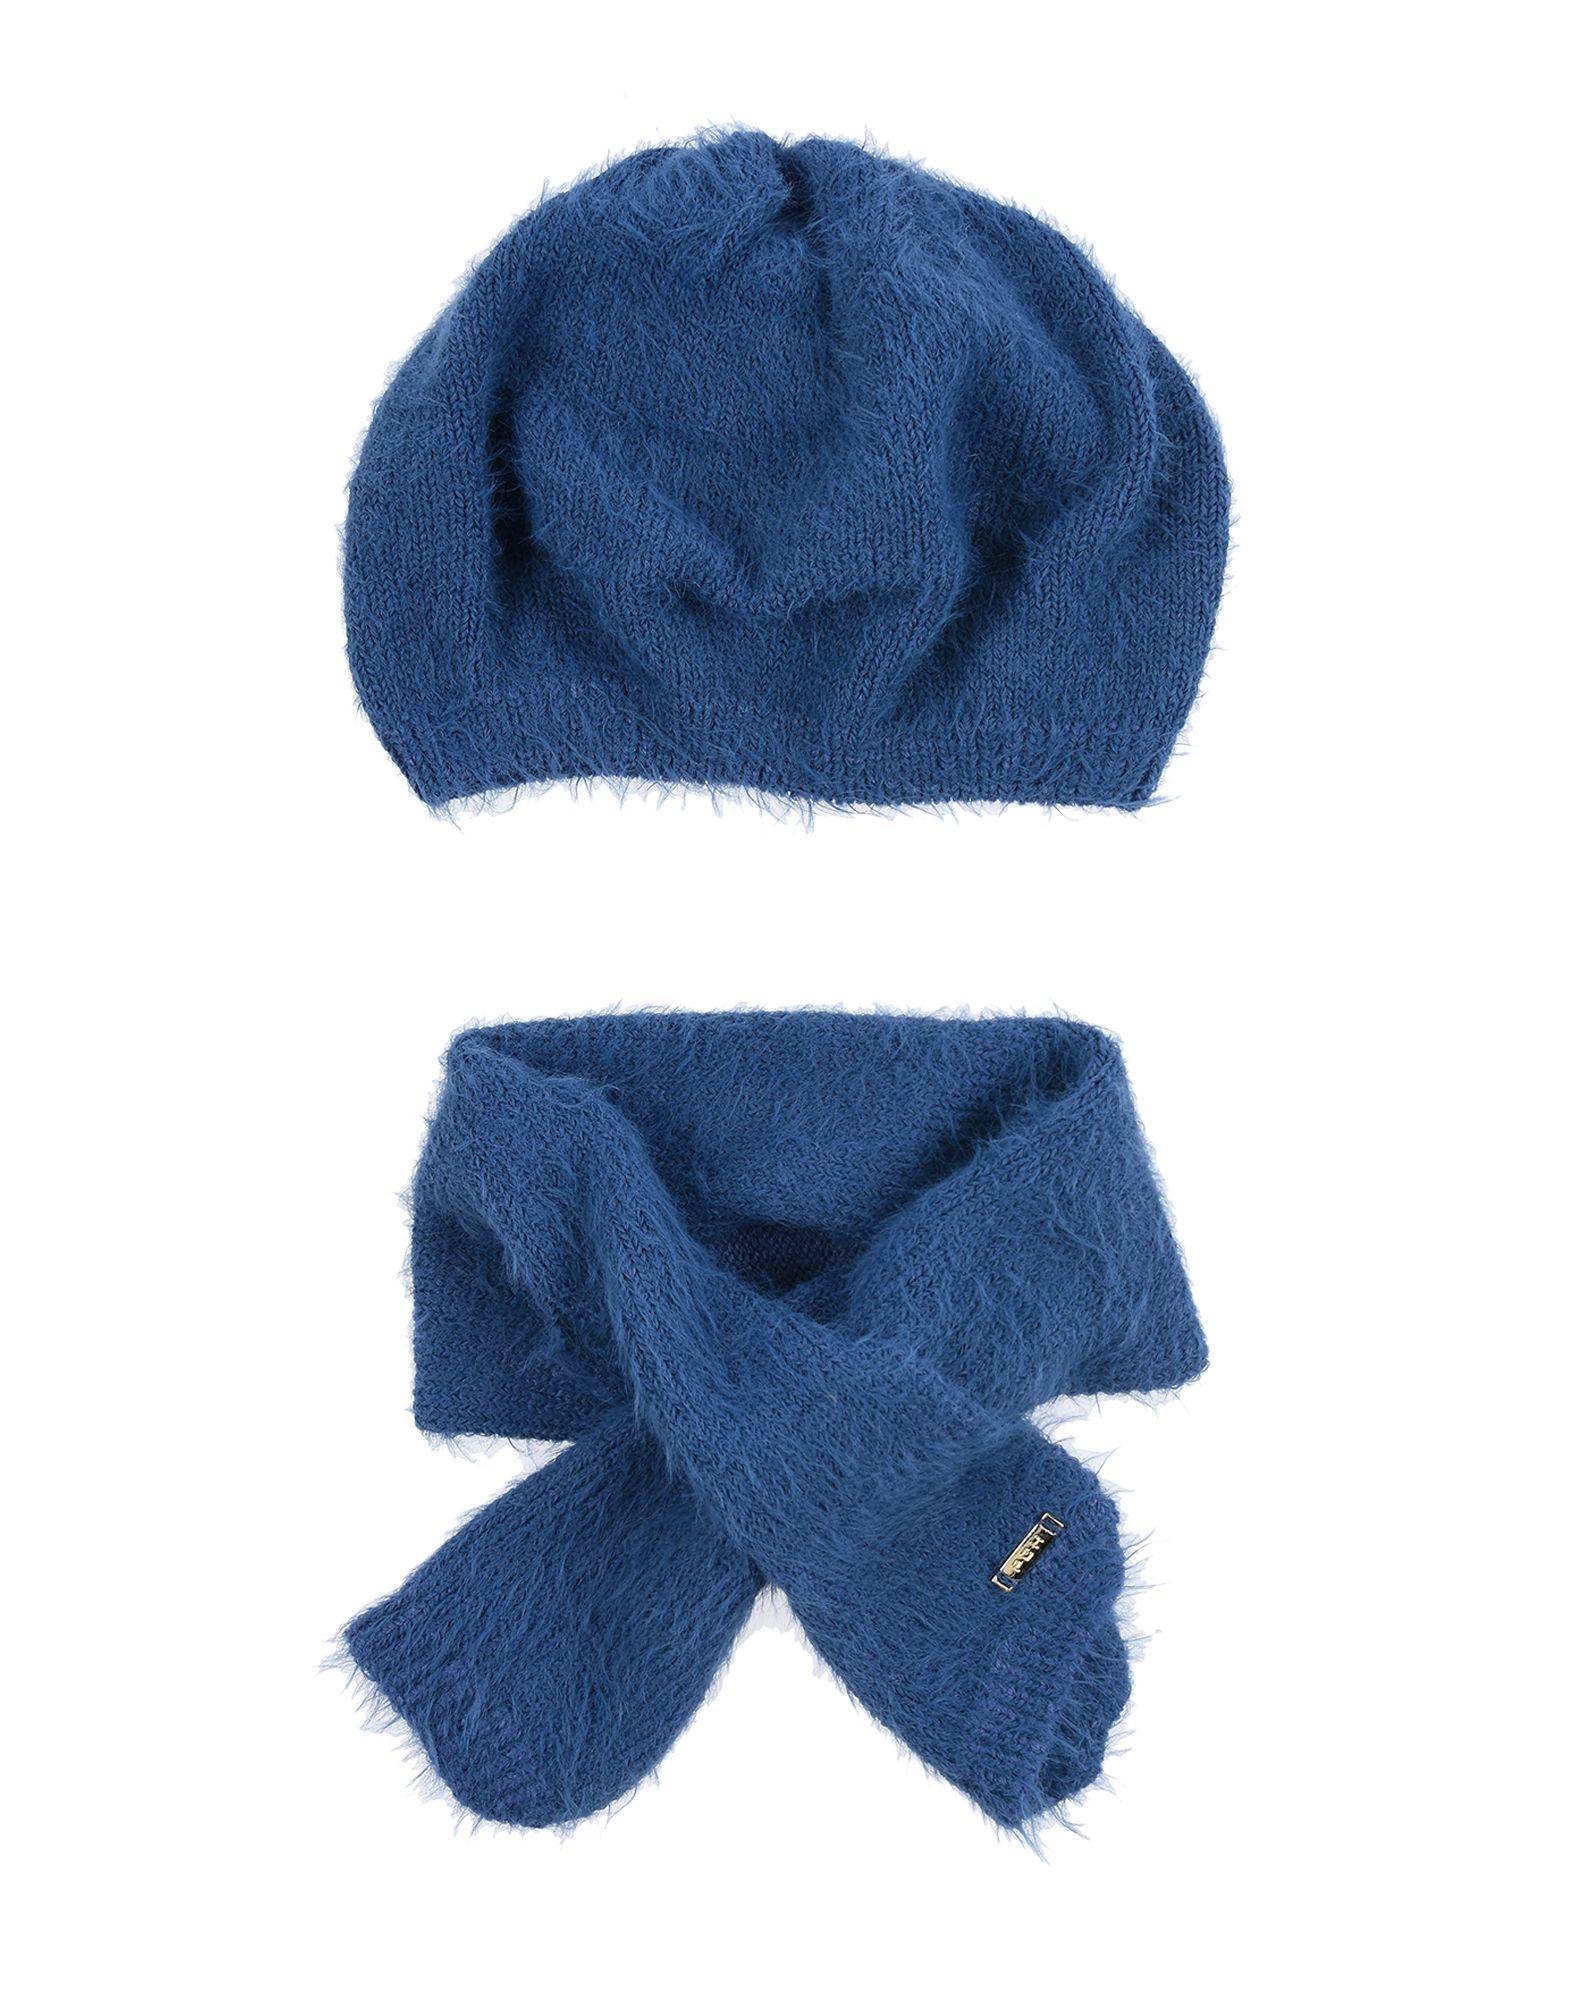 PAN CON CHOCOLATE Hats